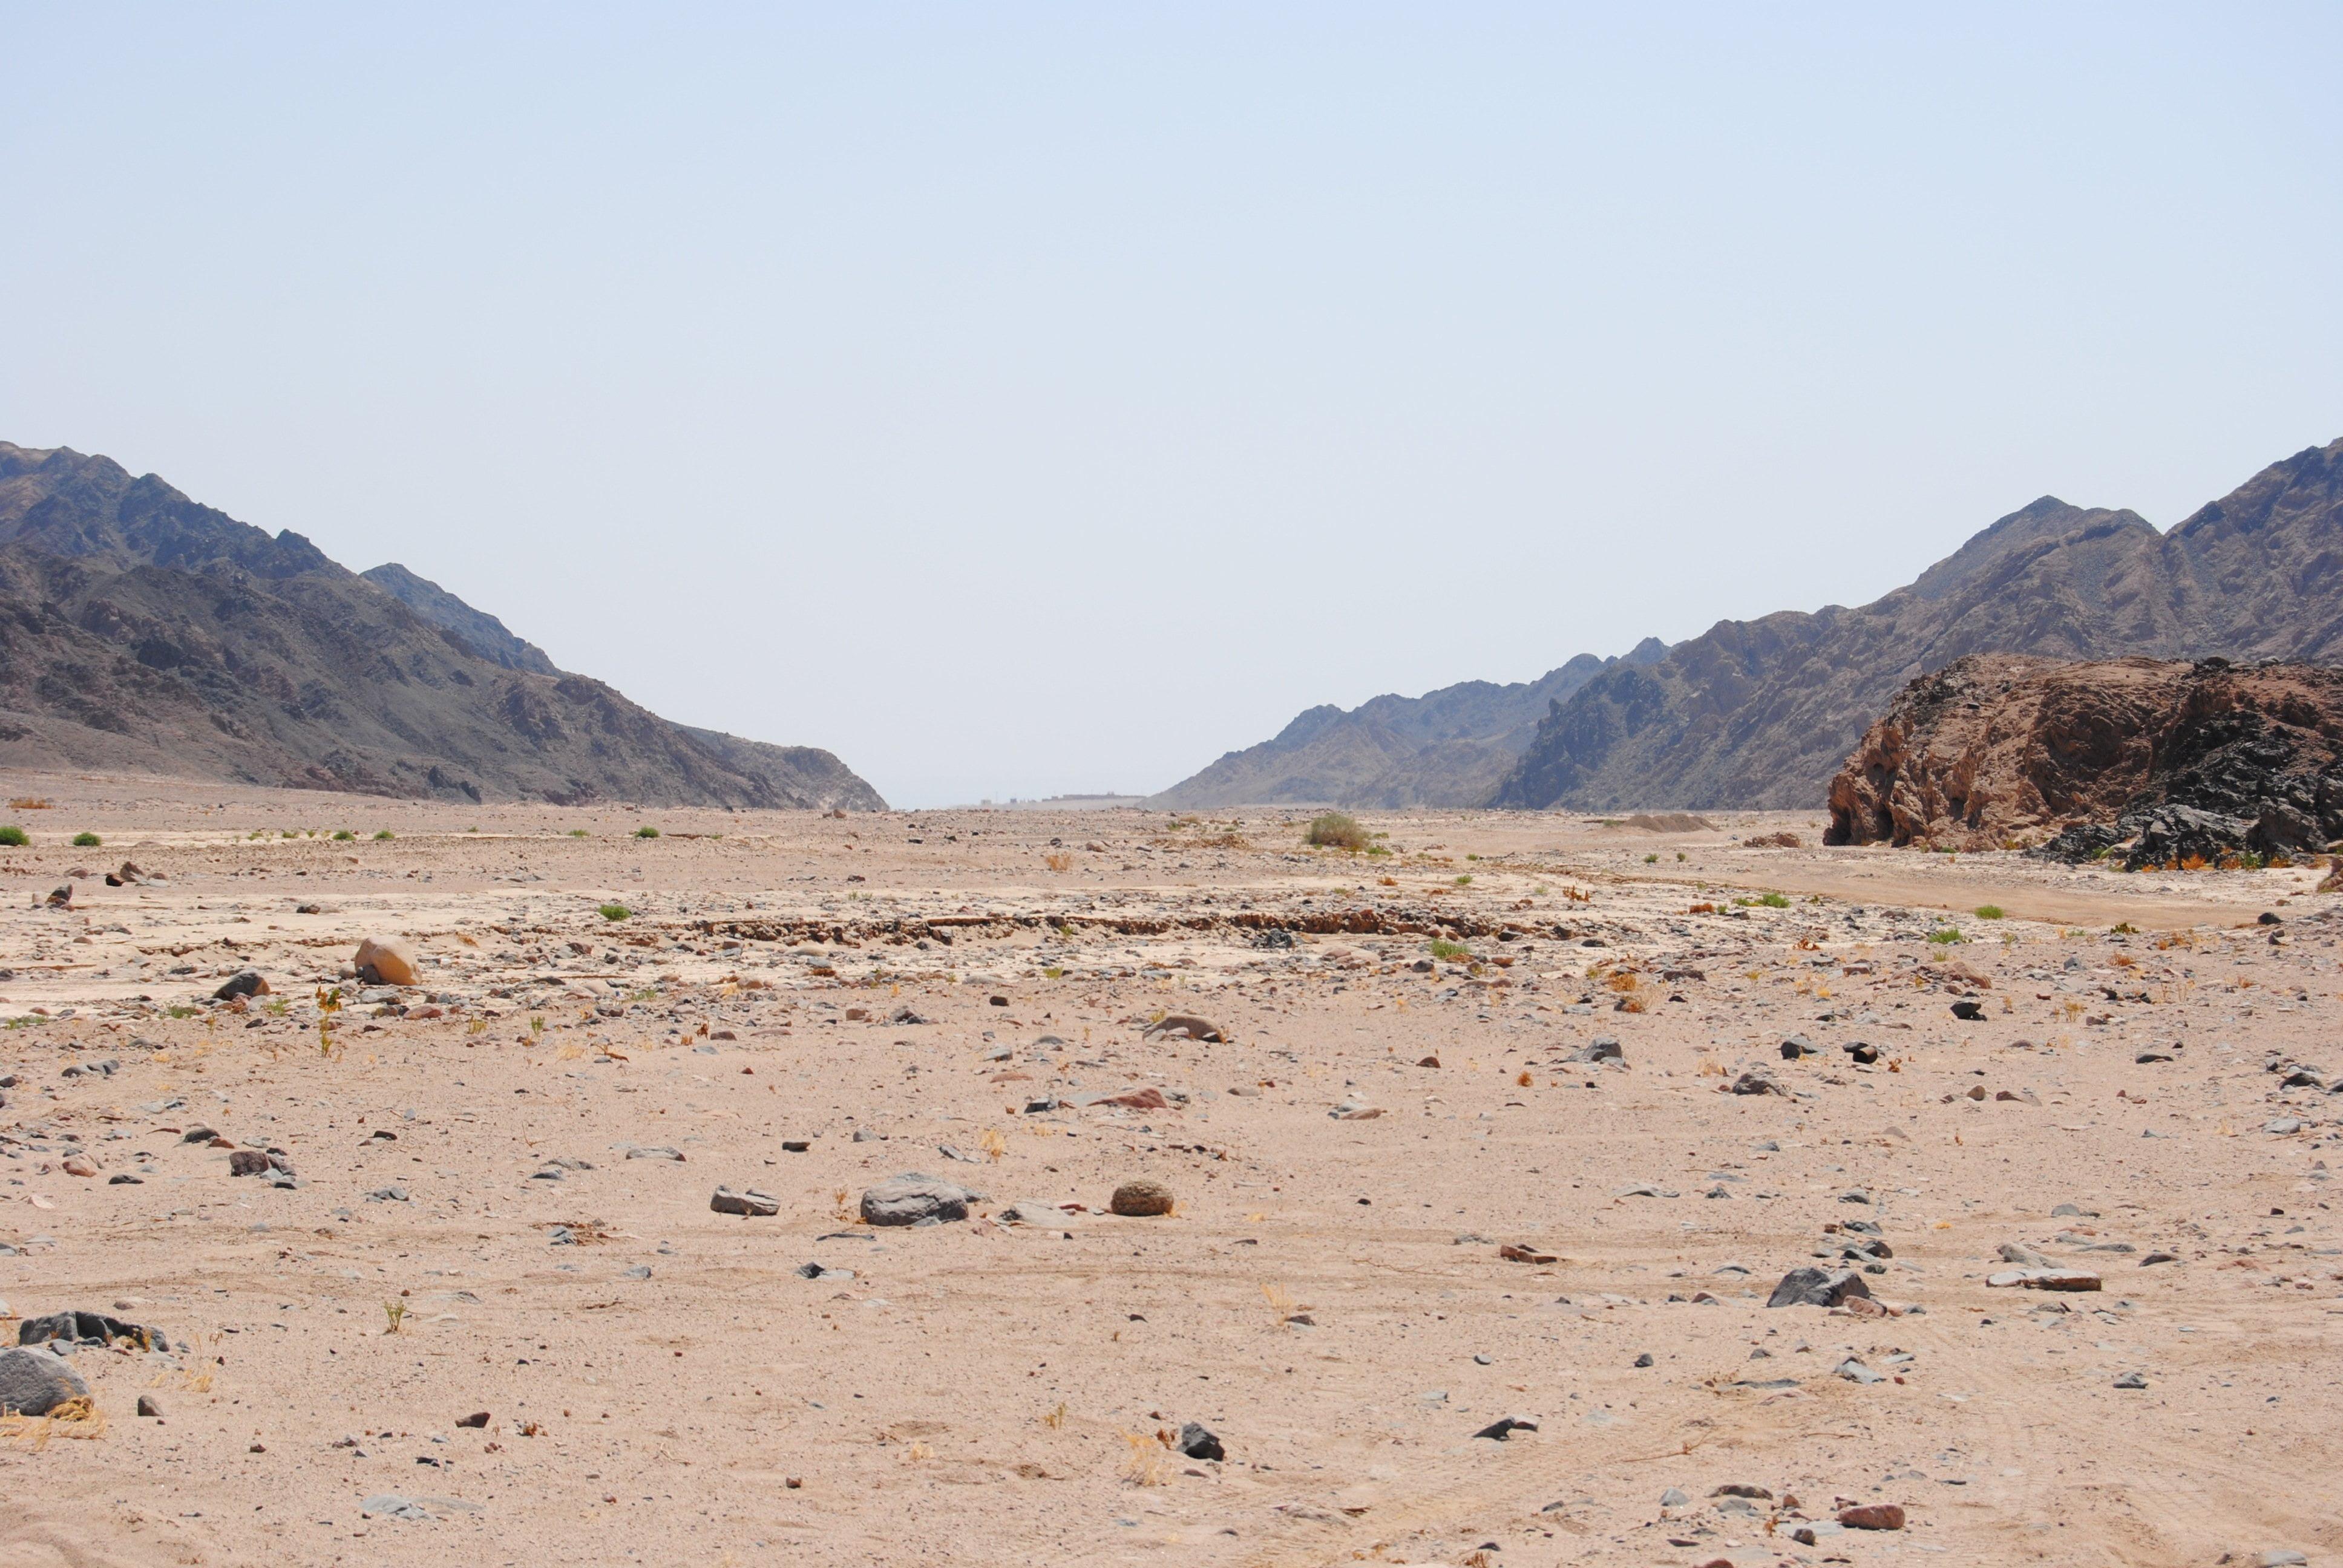 Jeep safari in the desert, Egypt 2